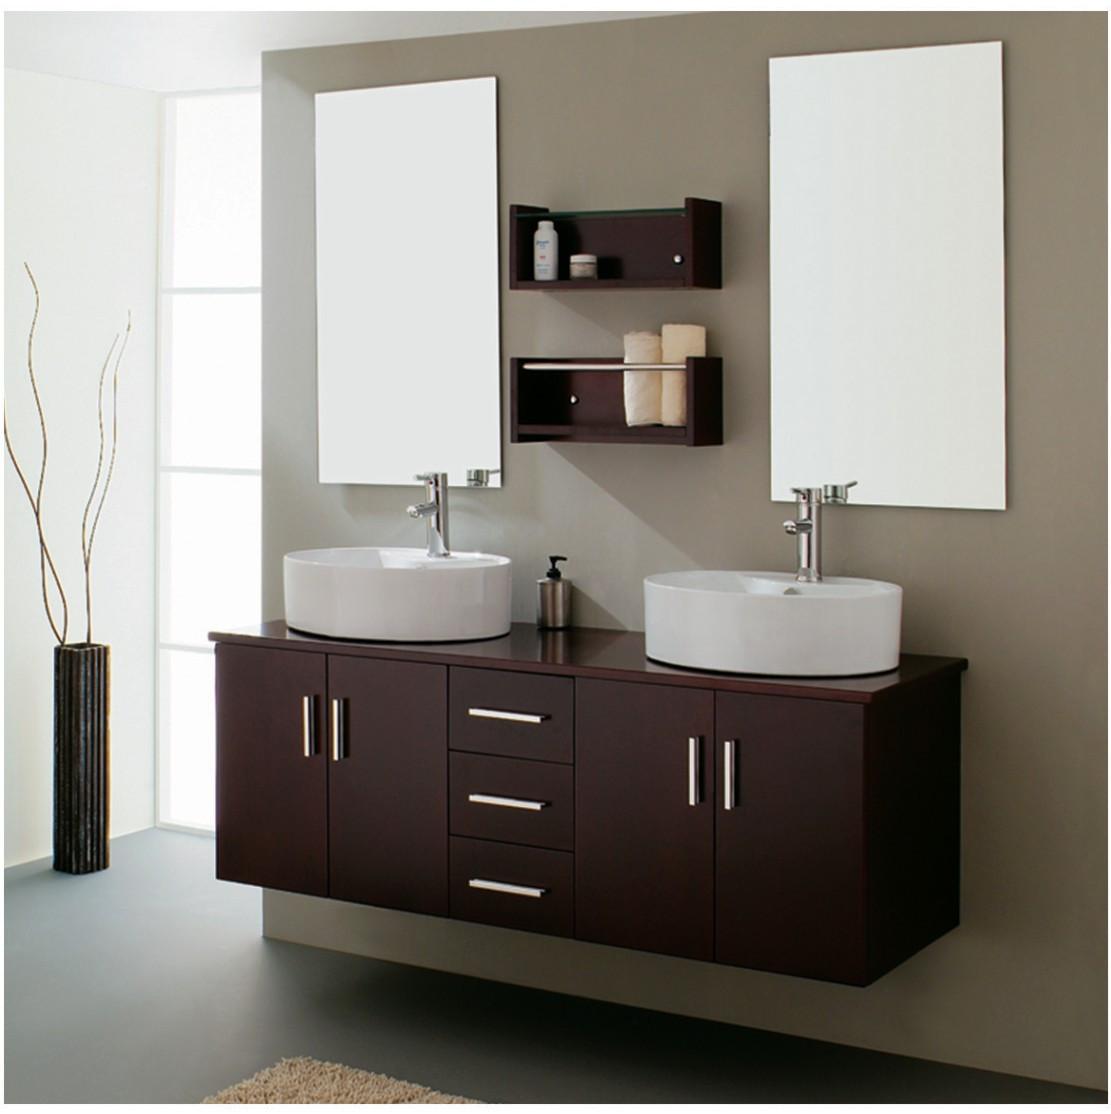 Best ideas about Modern Bathroom Vanities . Save or Pin Modern Bathroom Vanity Milano III Now.